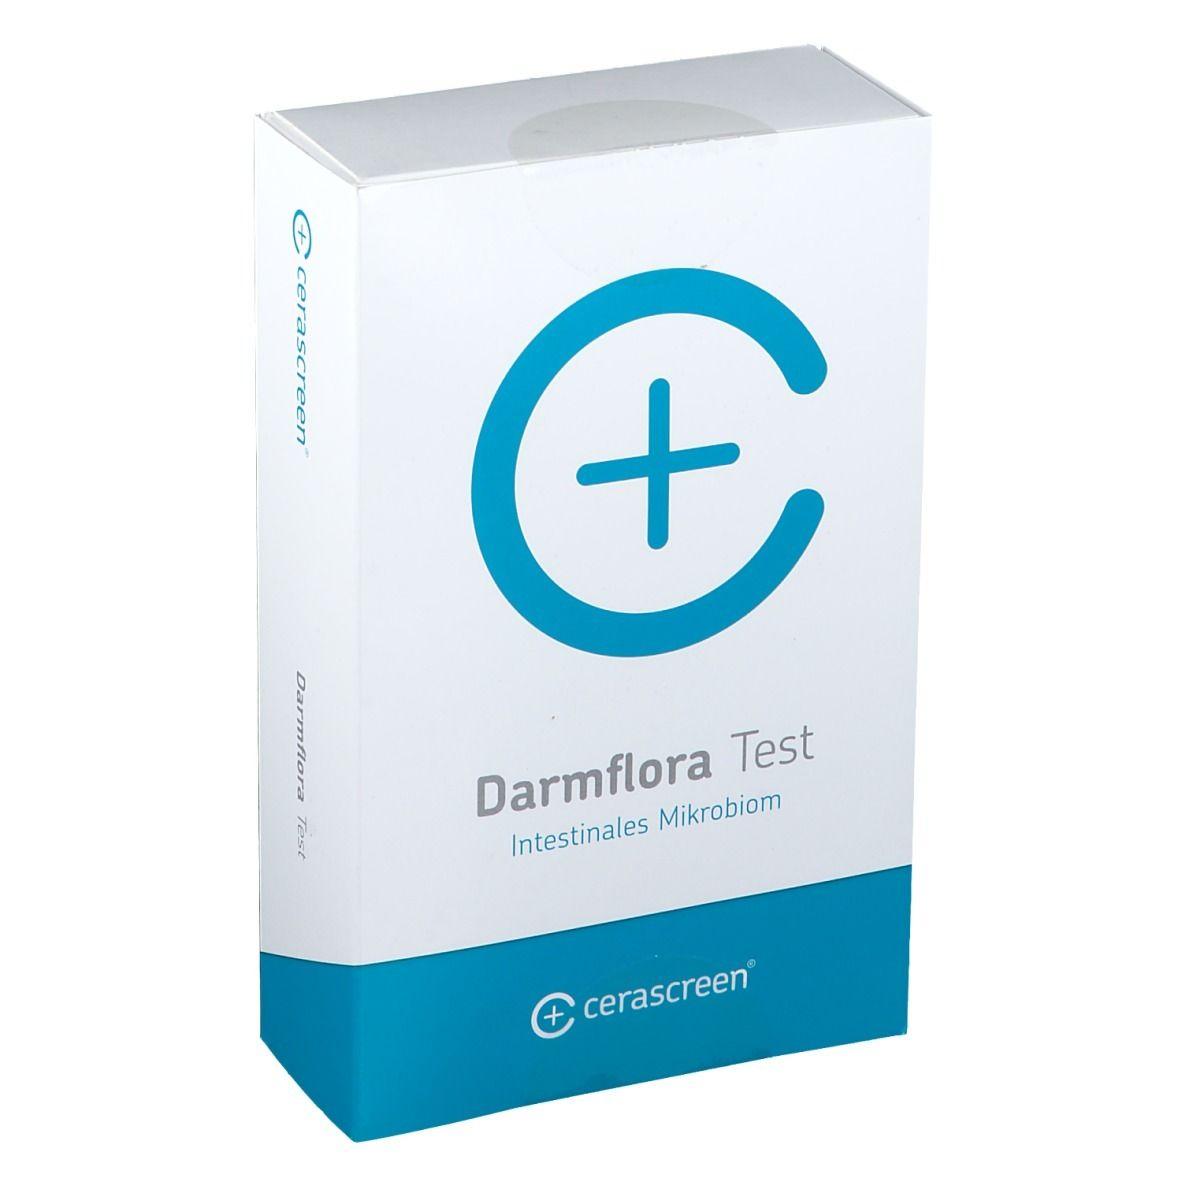 Darmflora Test